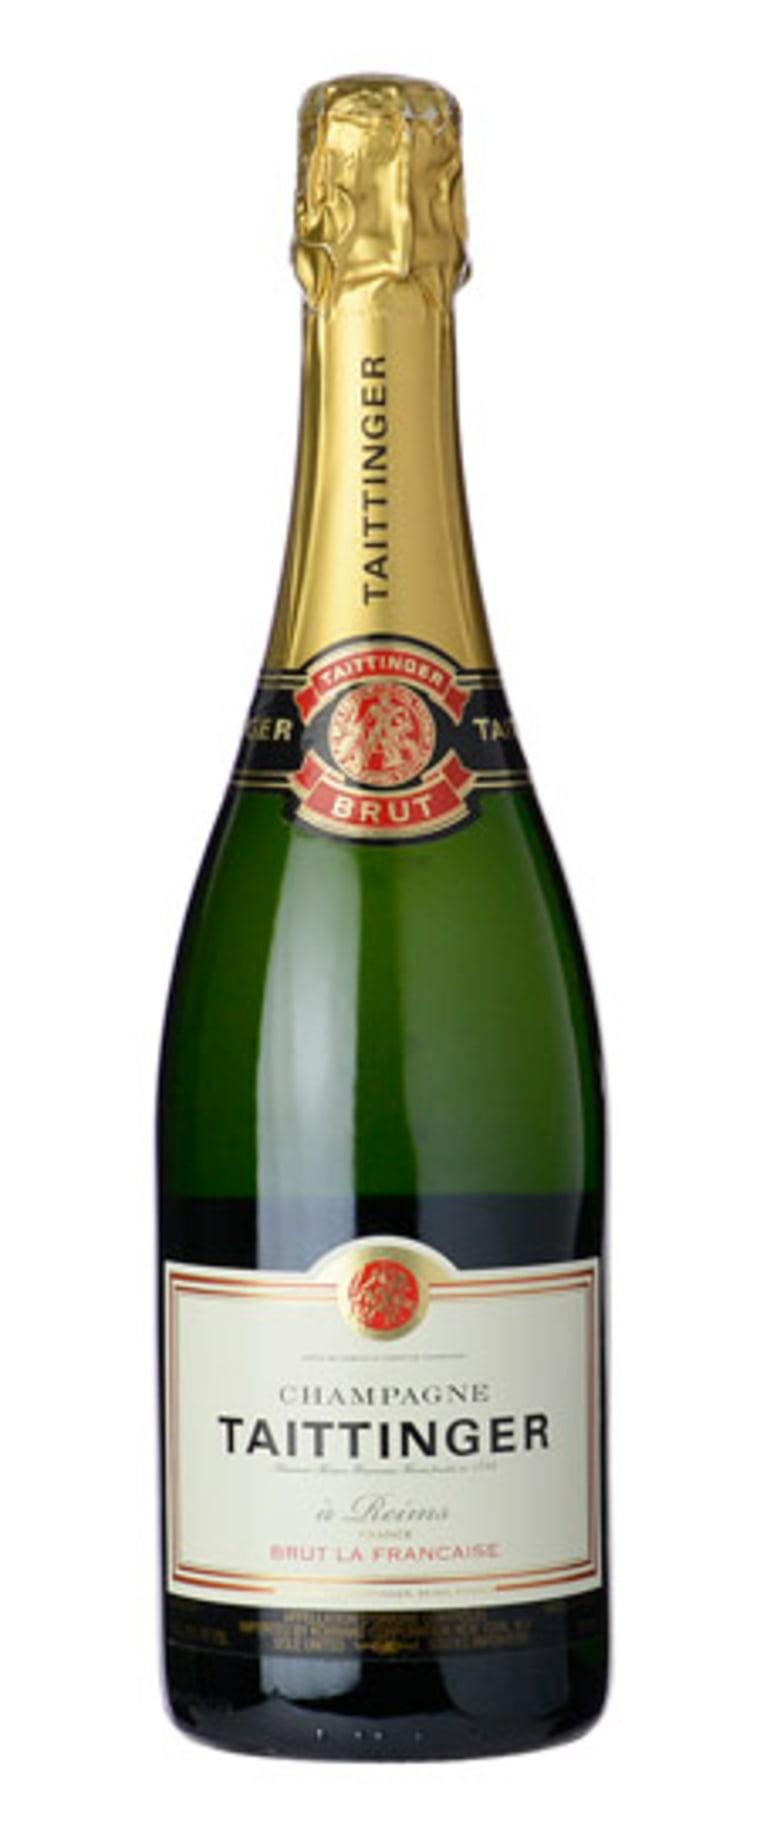 Champagne Taittinger, Brut La Francaise